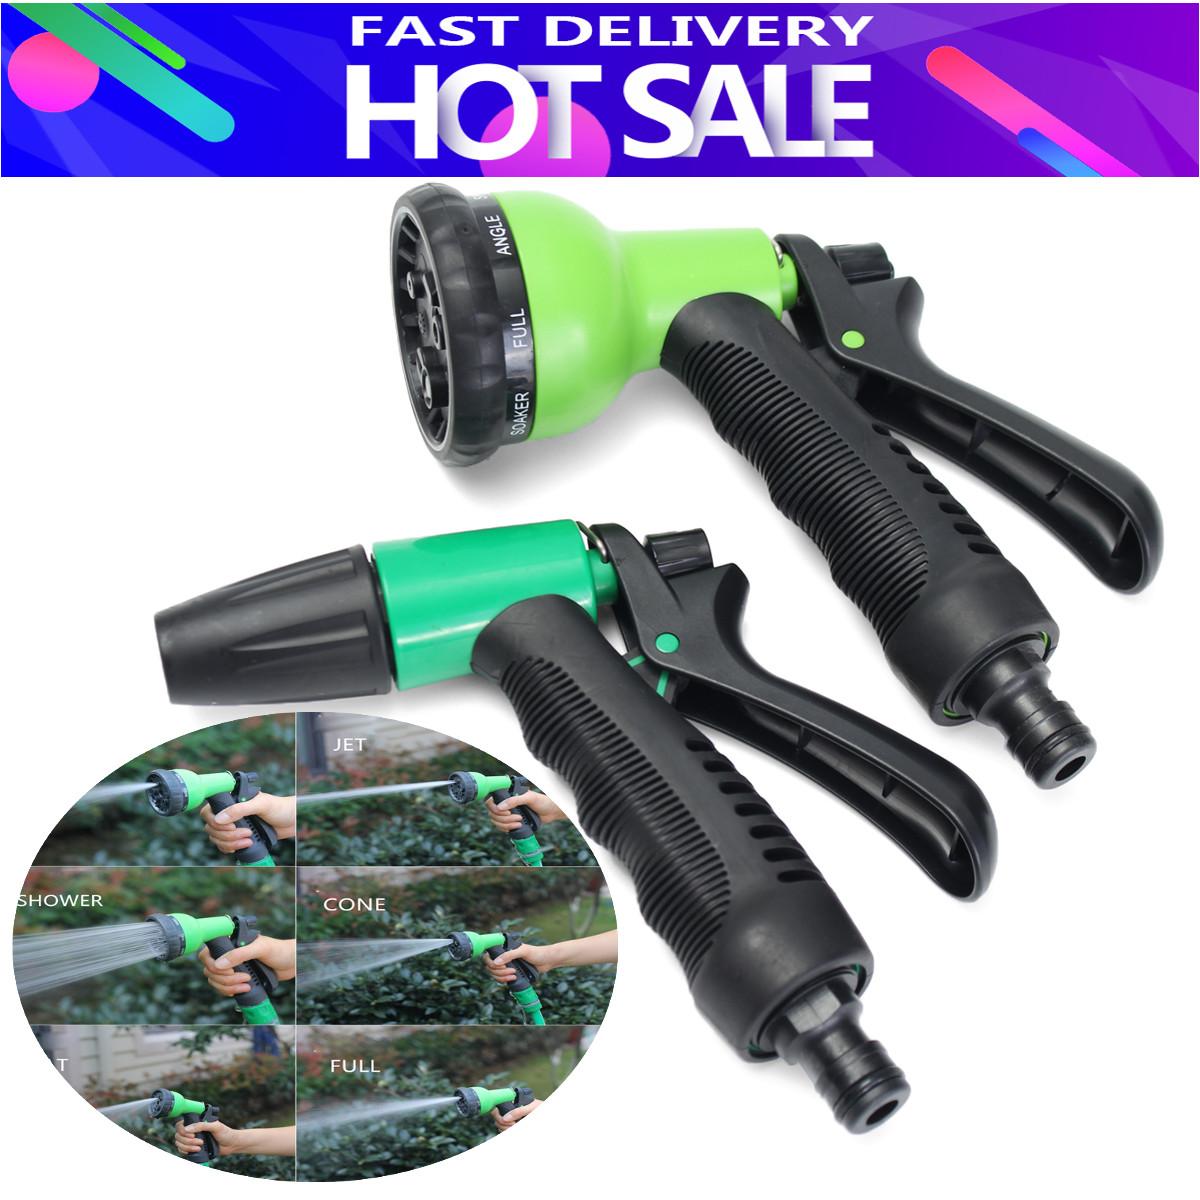 Garden Water Sprayer Hose Soft Grip Nozzle 8 Spray Settings Car Car Washer Supplies Washing- 2 Pack